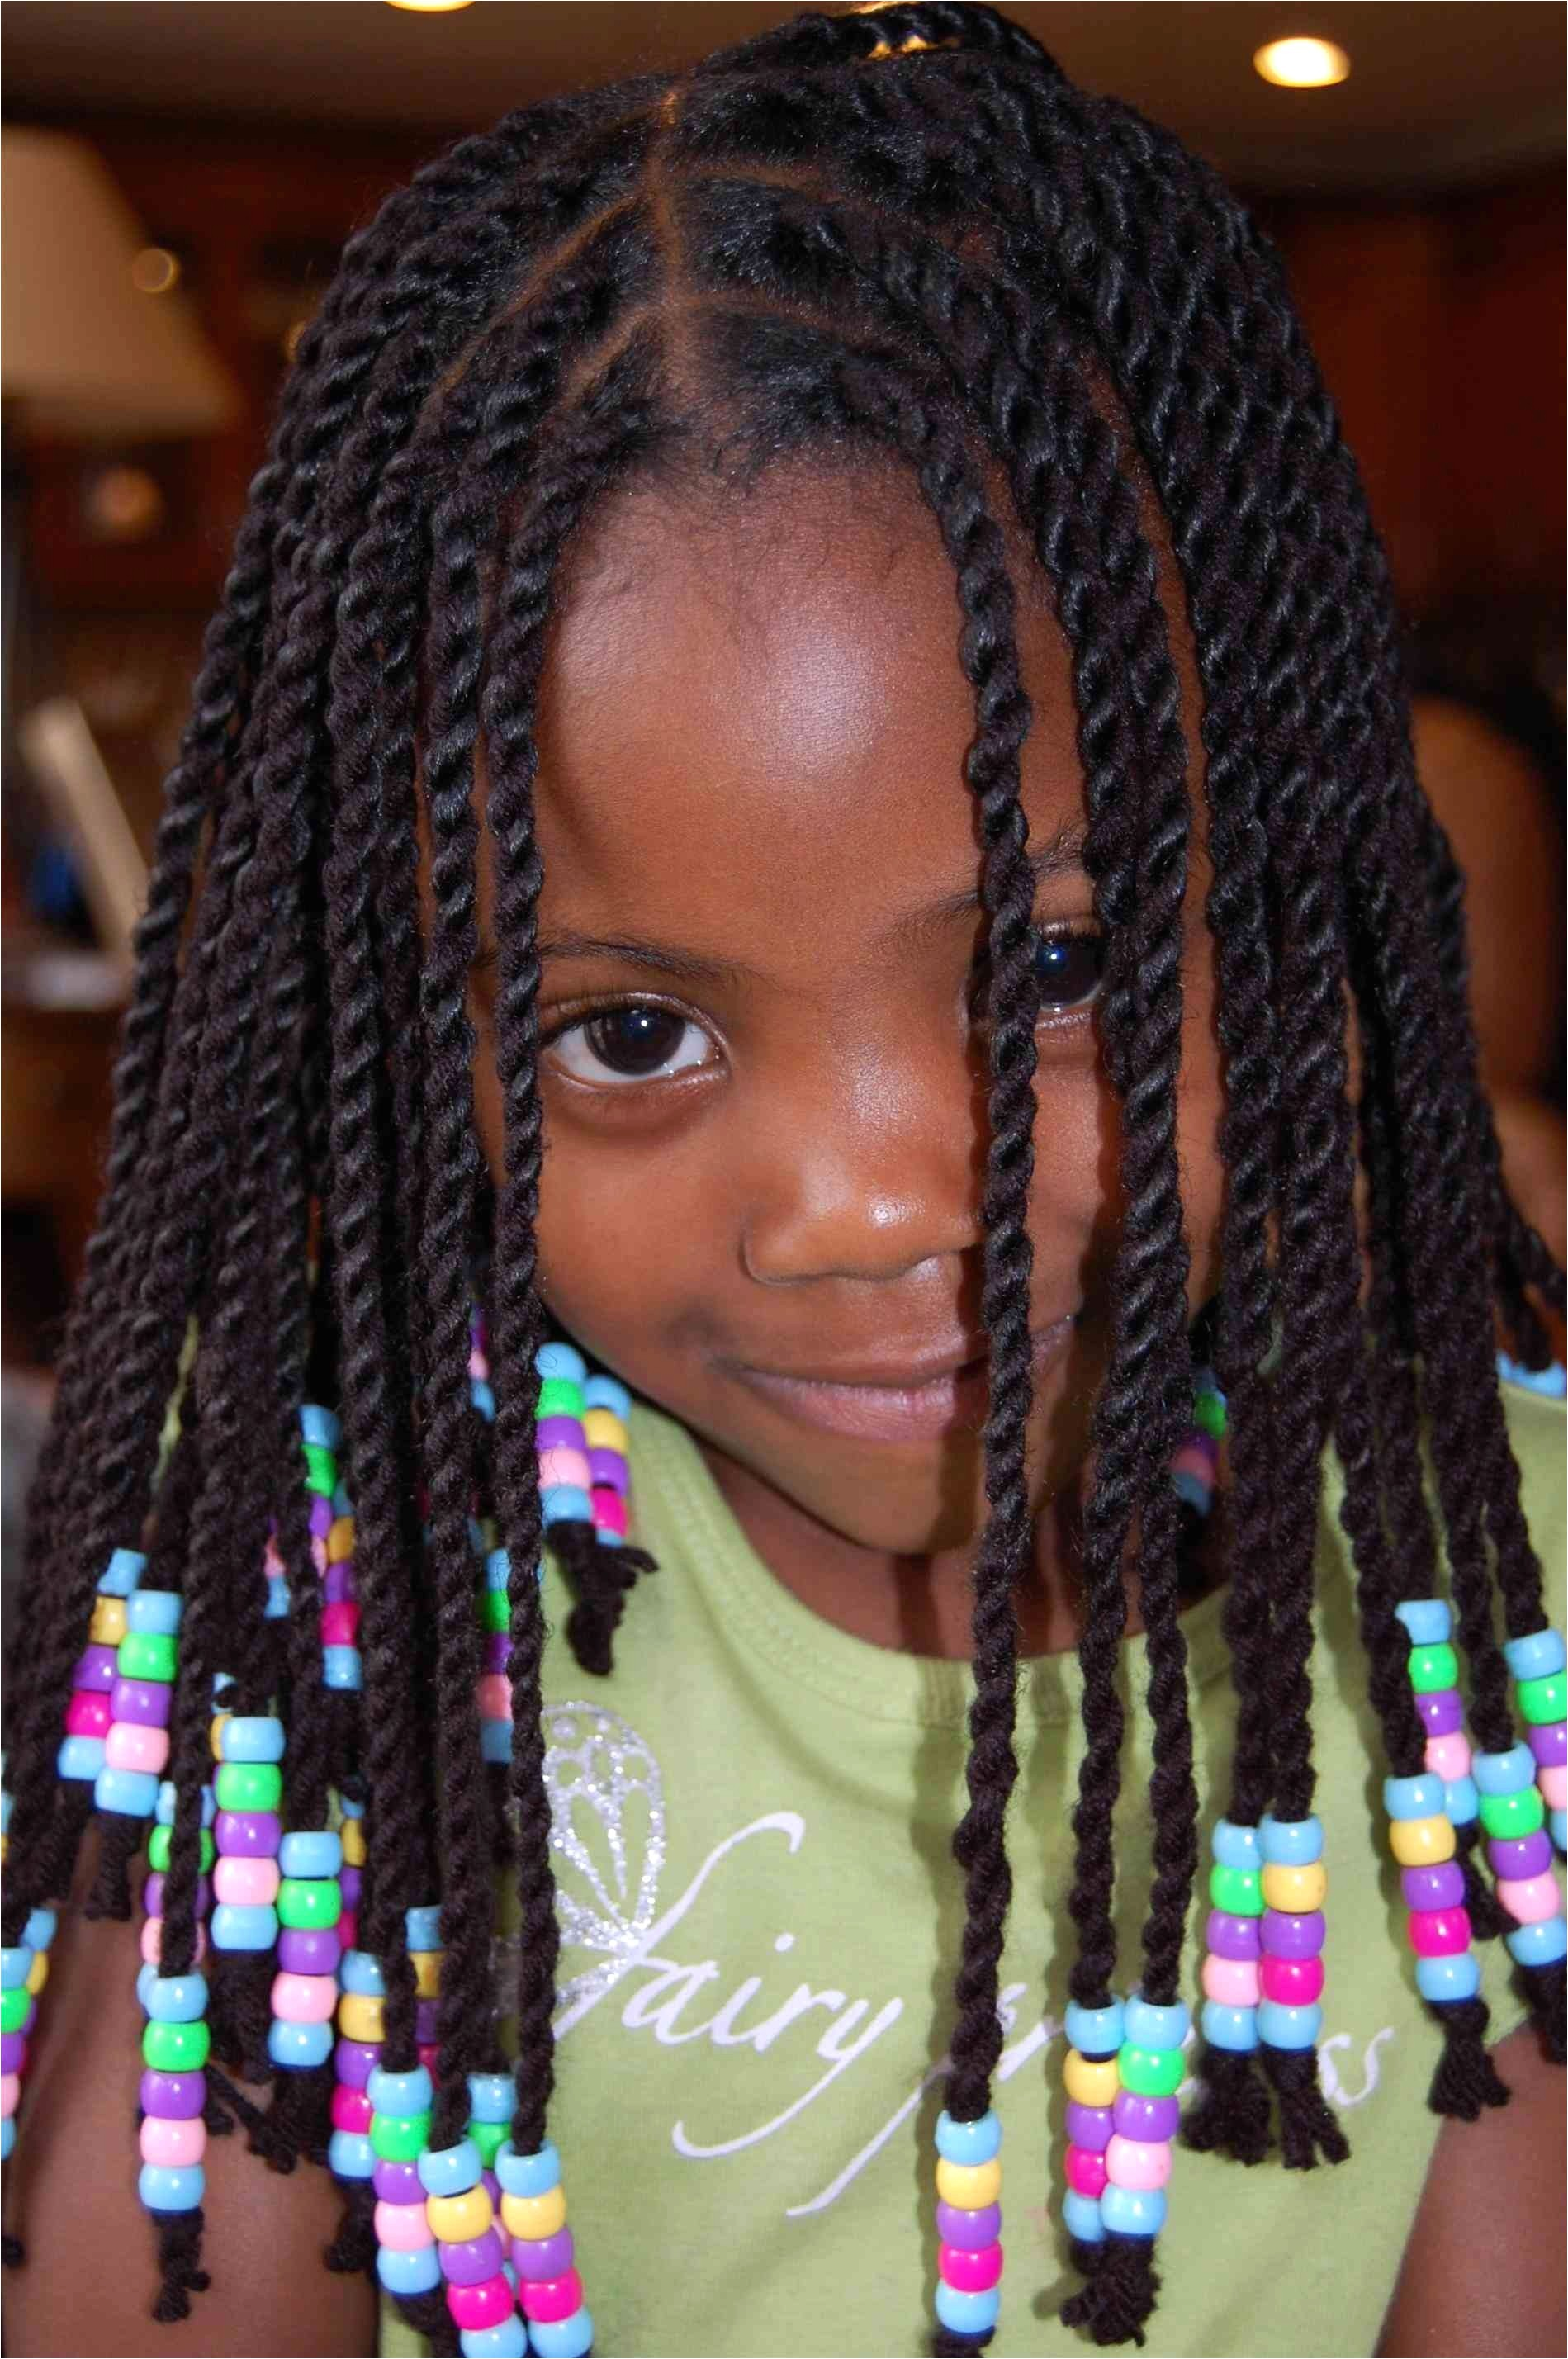 Black Kids Braids Hairstyles 30 Beautiful African American Children Hairstyles